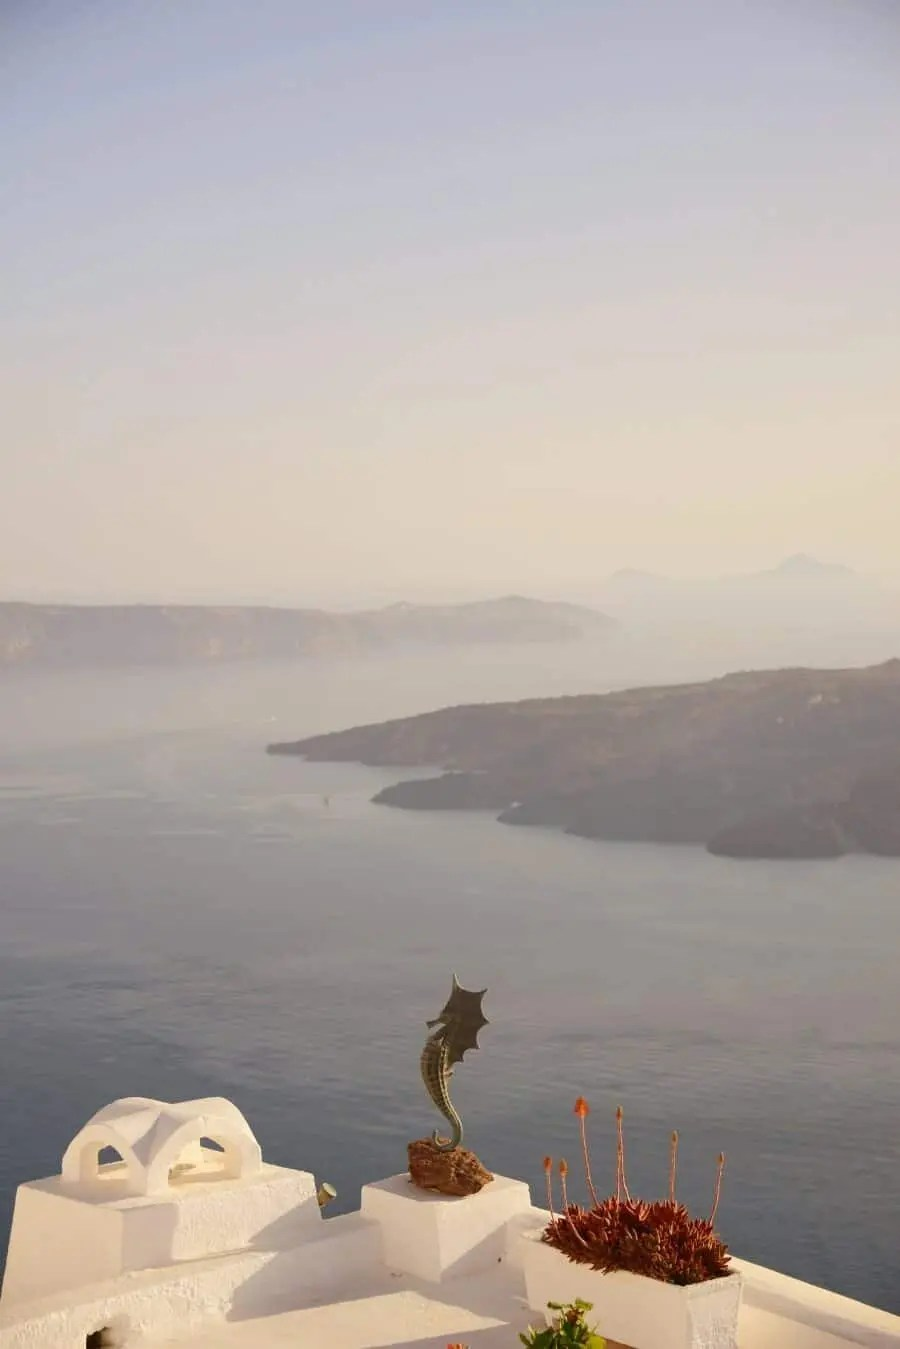 Santorini Photo Locations by The Wandering Lens www.thewanderinglens.com